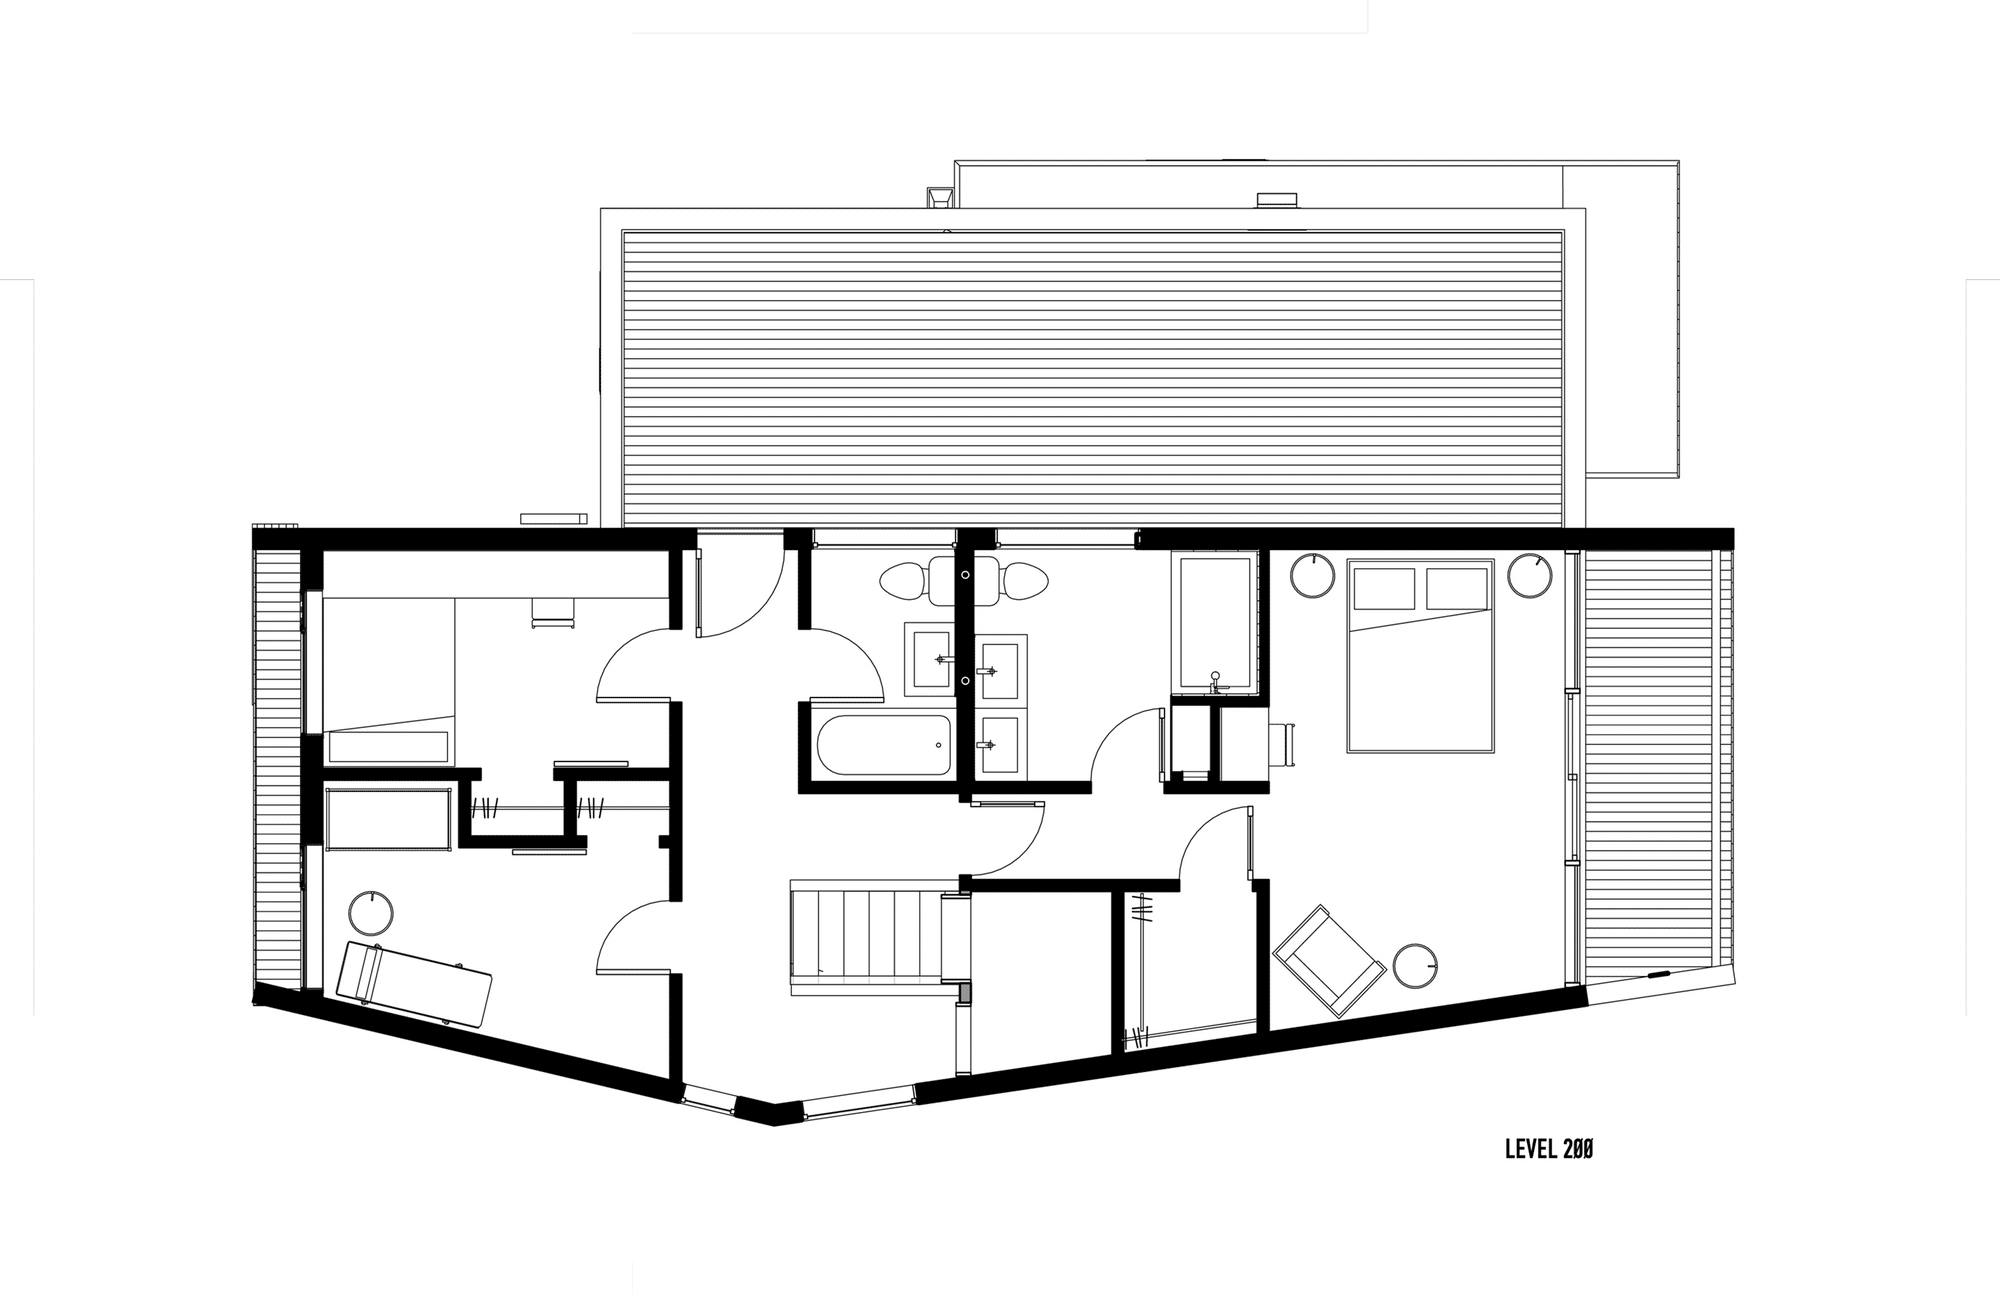 Planos de casa de dos pisos moderna for Planos de casas 1 planta